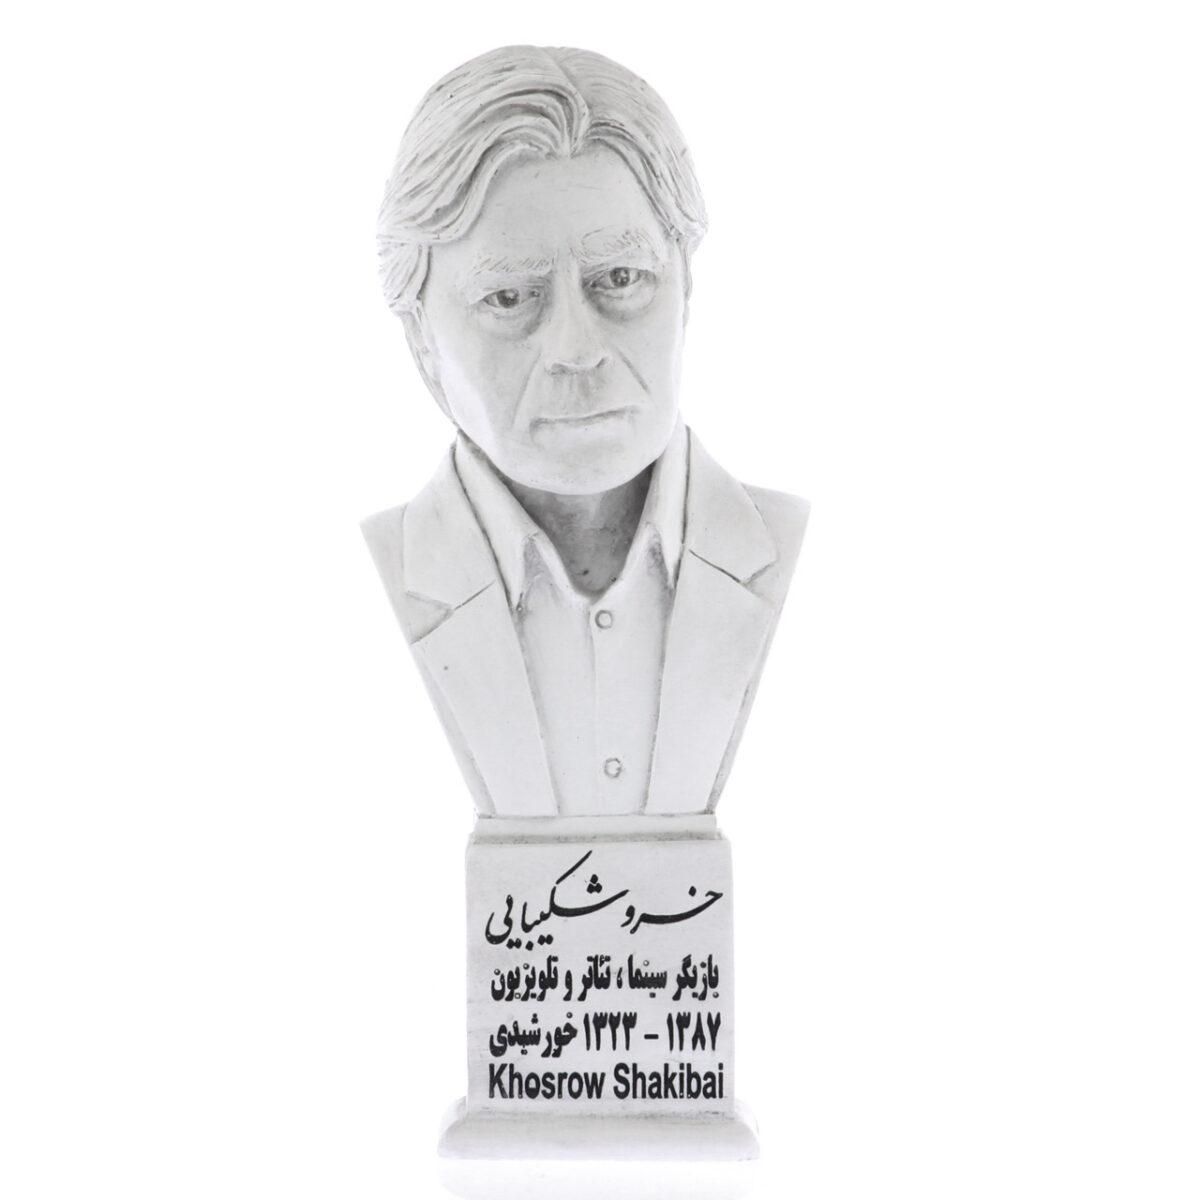 khosrow shakibaei s 1200x1200 - سردیس زنده یاد خسرو شکیبایی